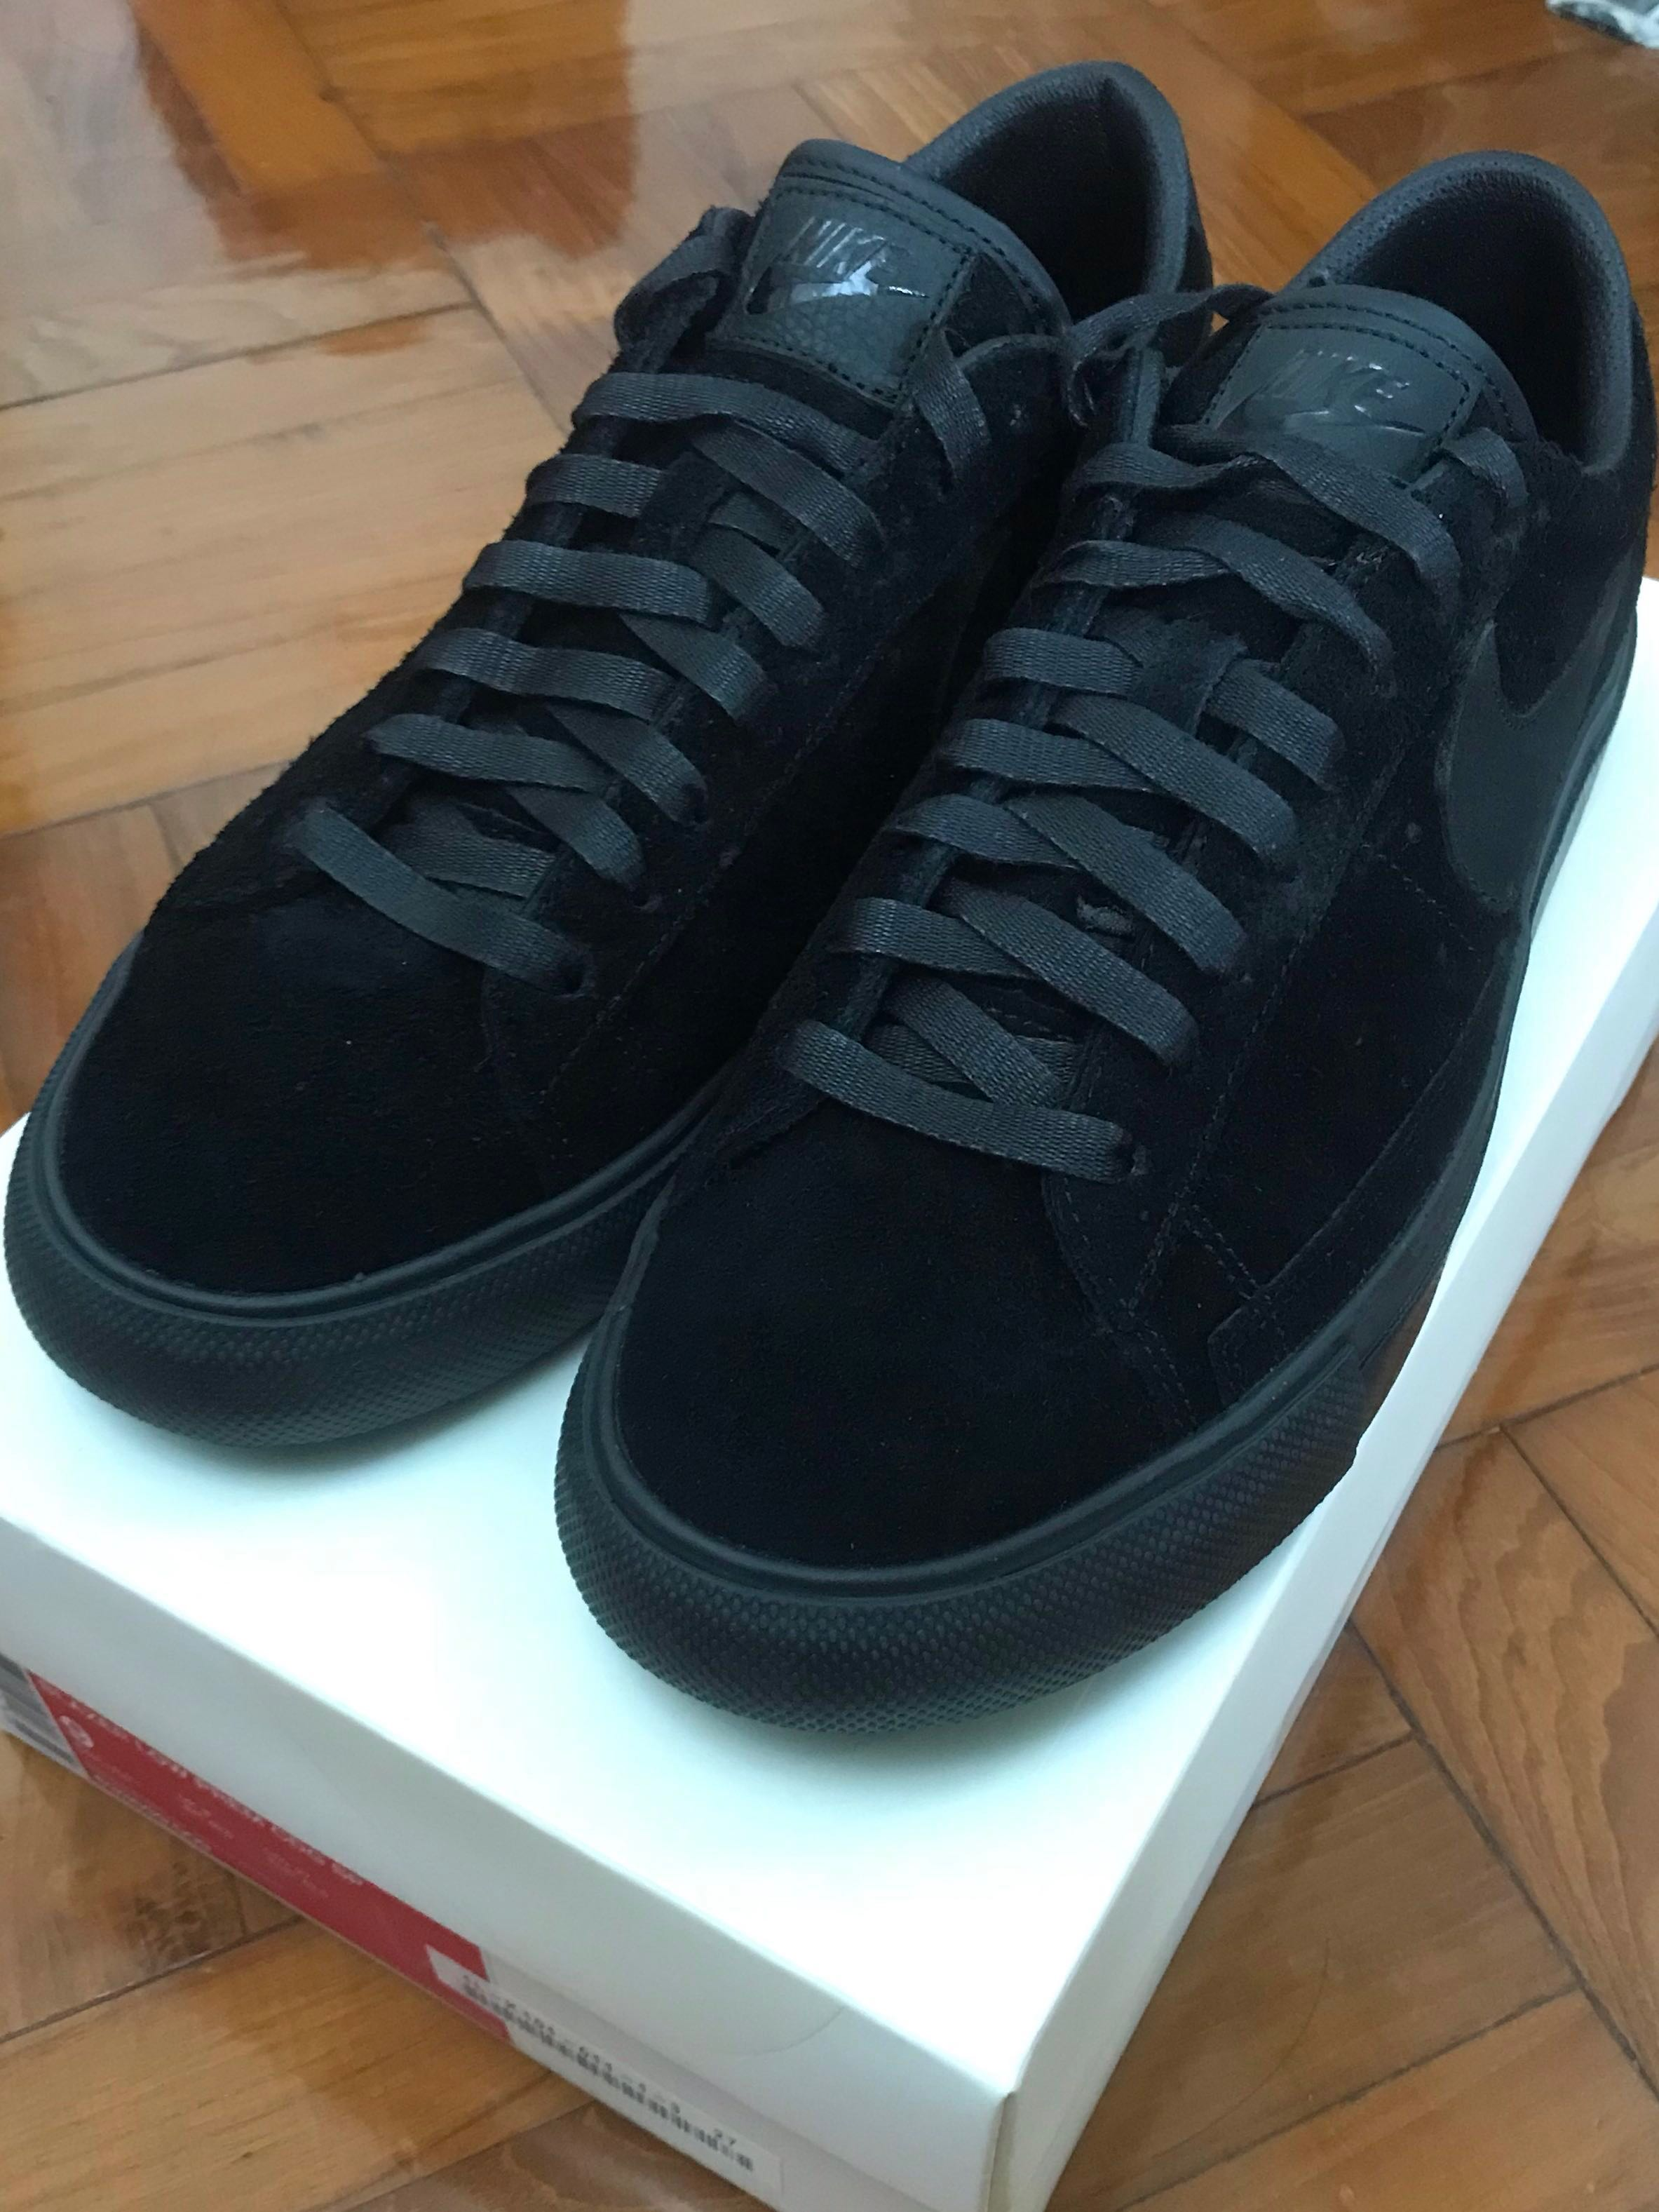 official photos 2e6e5 d63e0 Nike SB Blazer Low Comme des Garcons Black